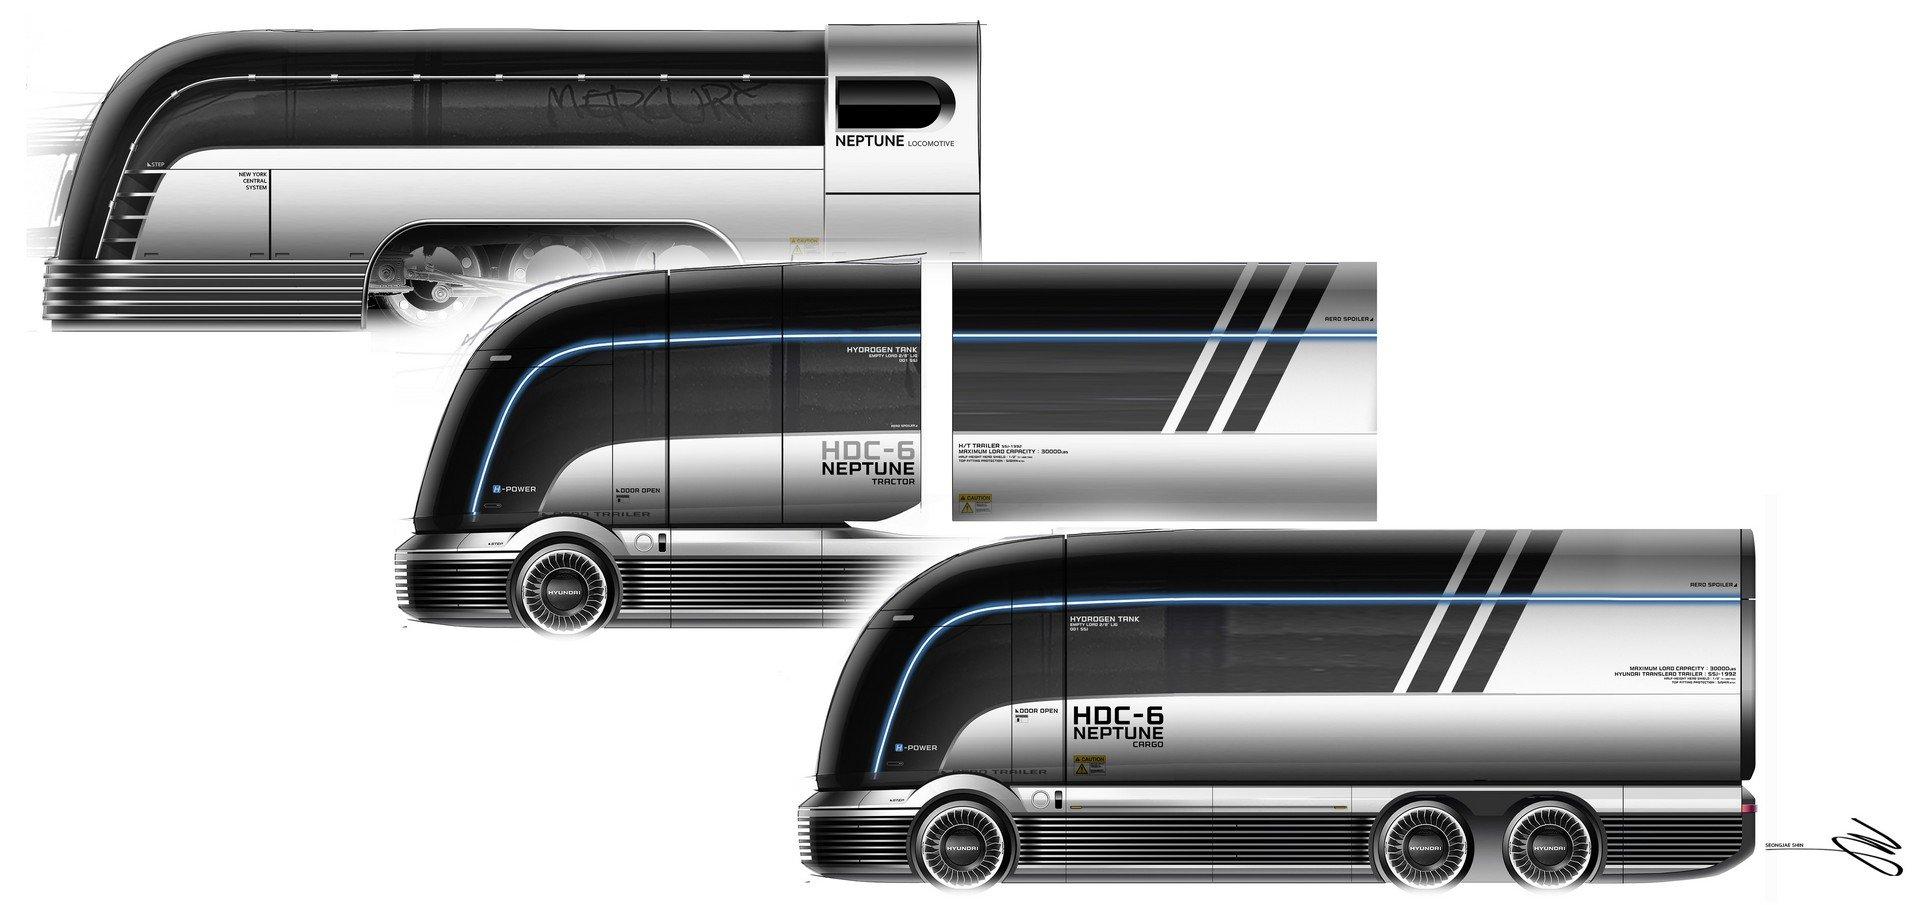 Hyundai-HDC-6-Neptune-Concept-6